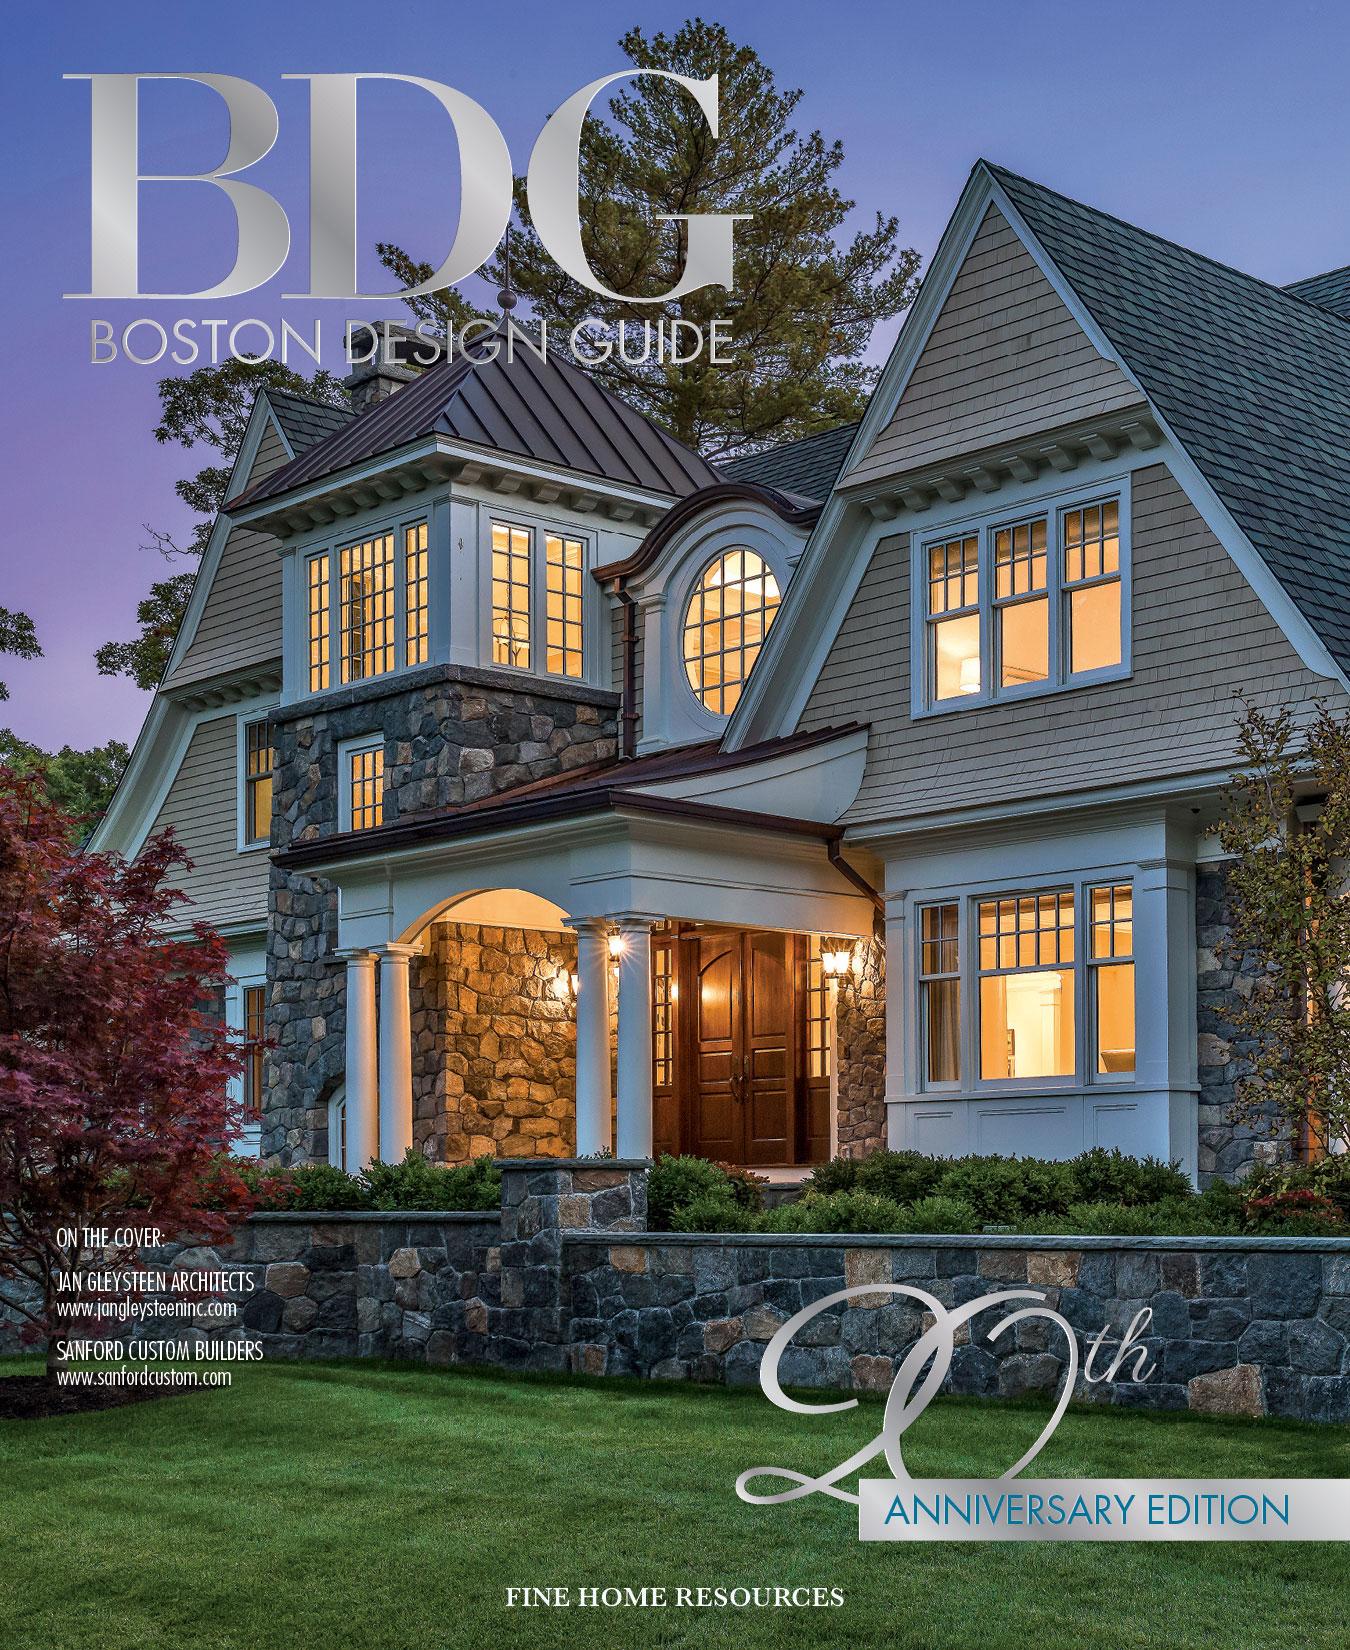 Boston Design Guide 20th Edition Jan Gleysteen Architects Sanford Custom Builders